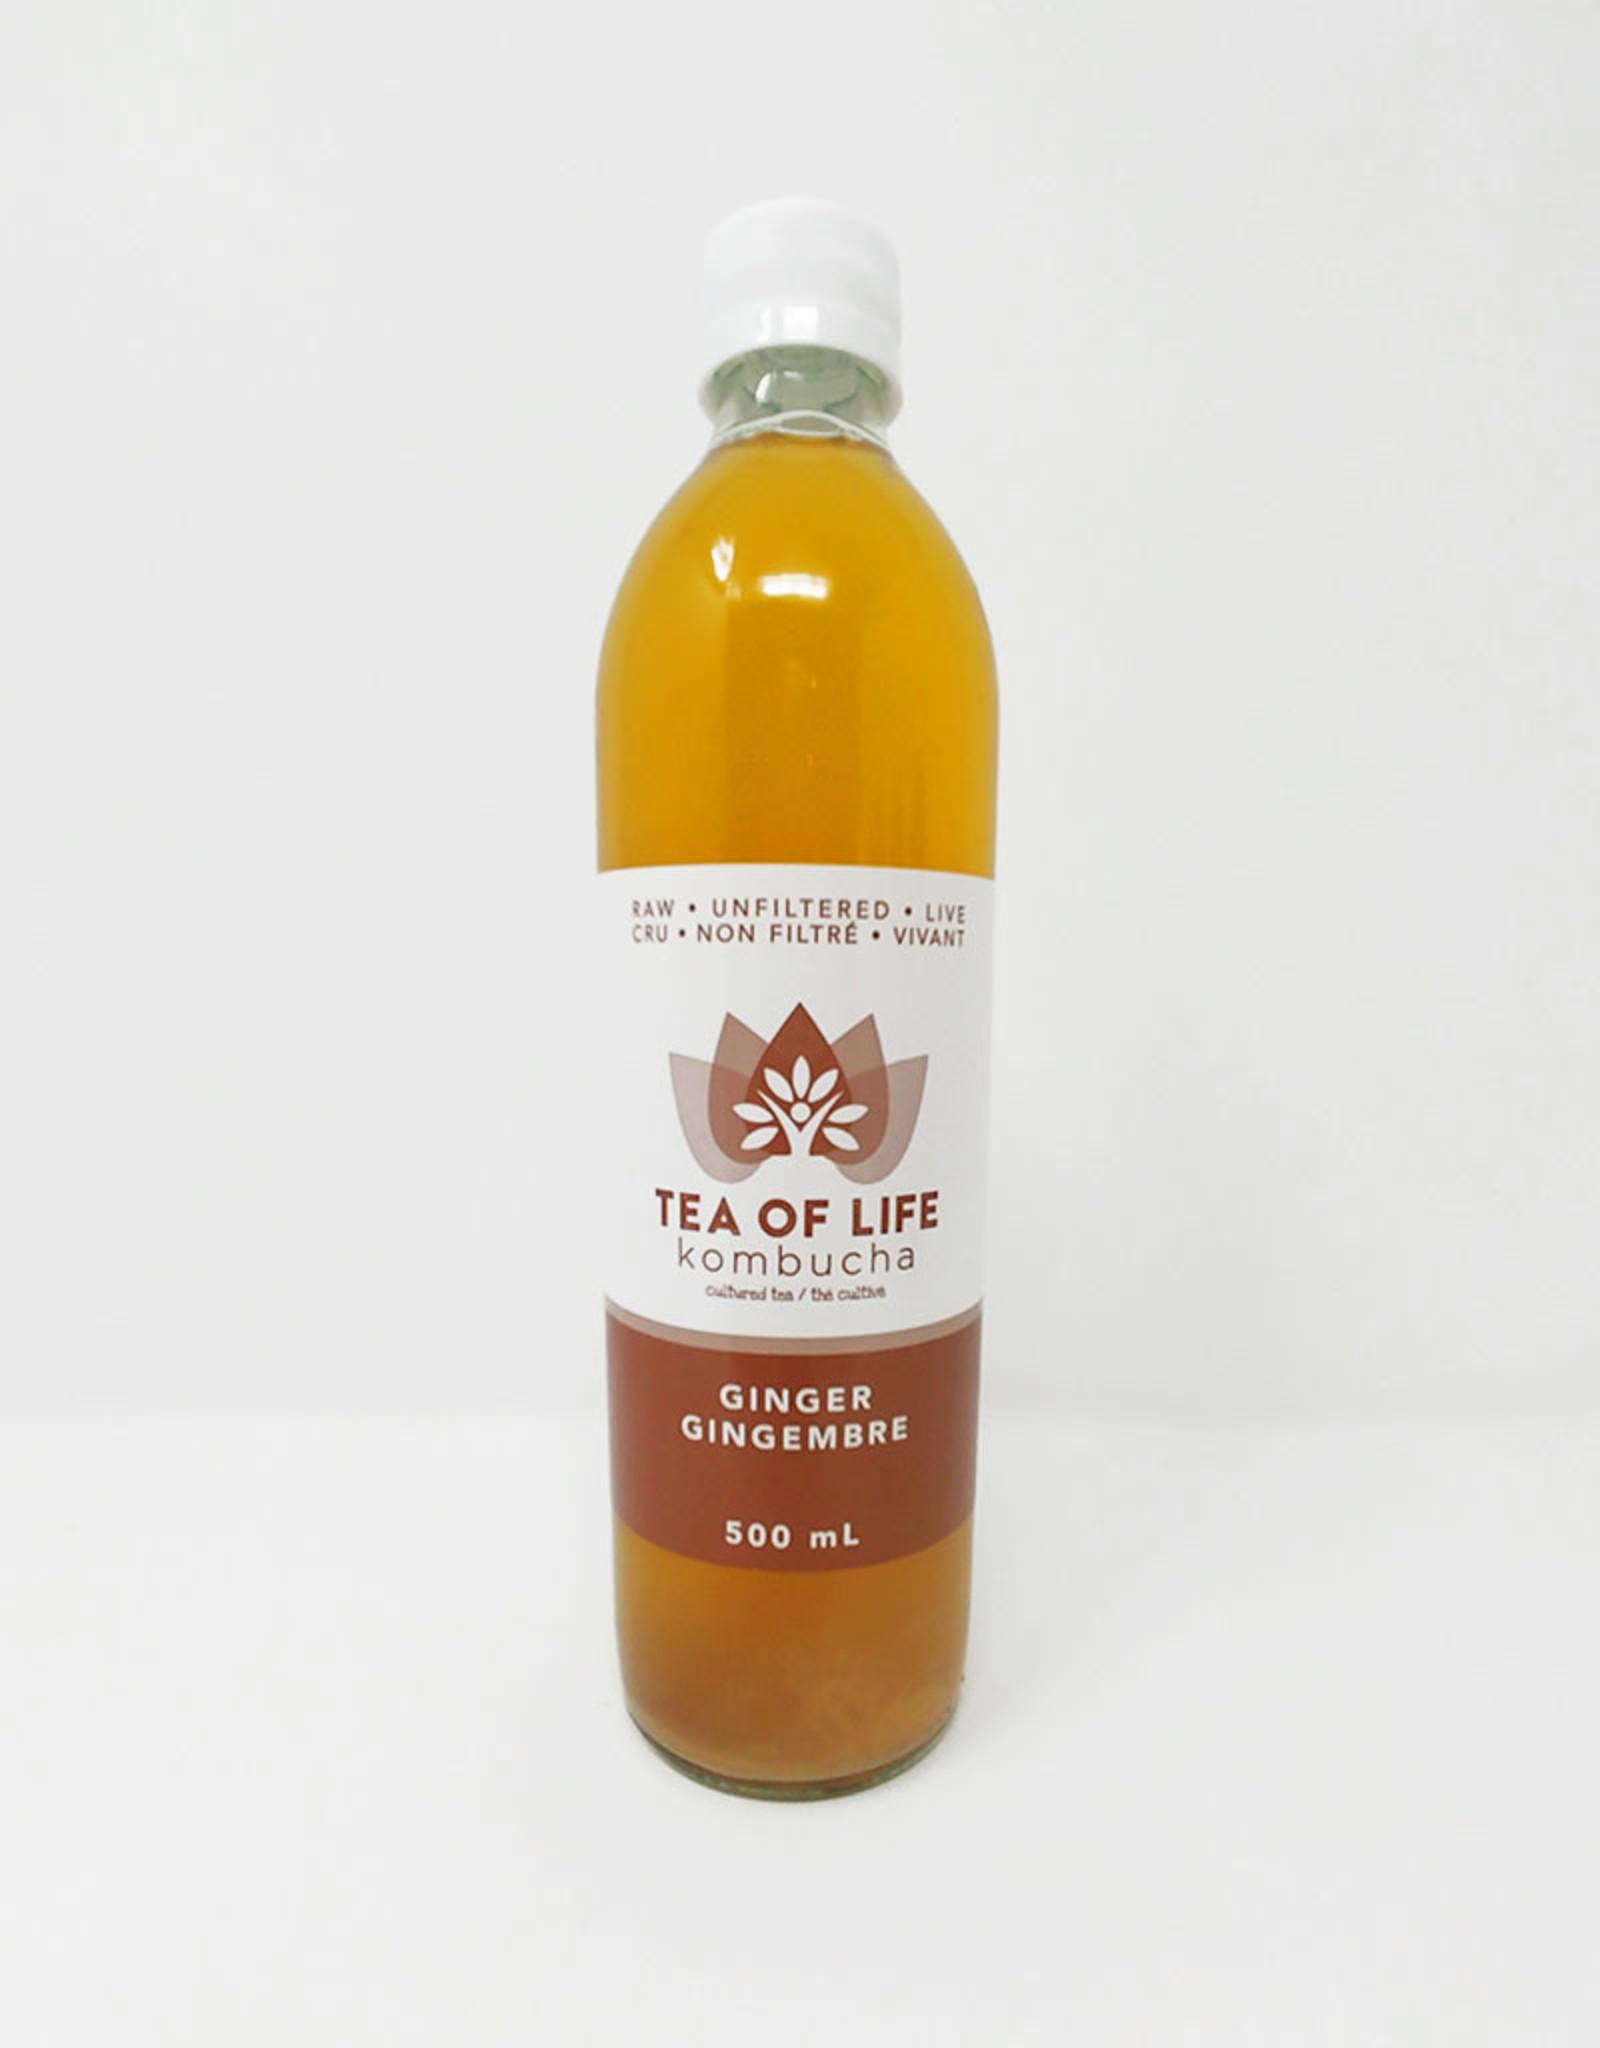 Tea of Life Tea of Life - Kombucha, Ginger